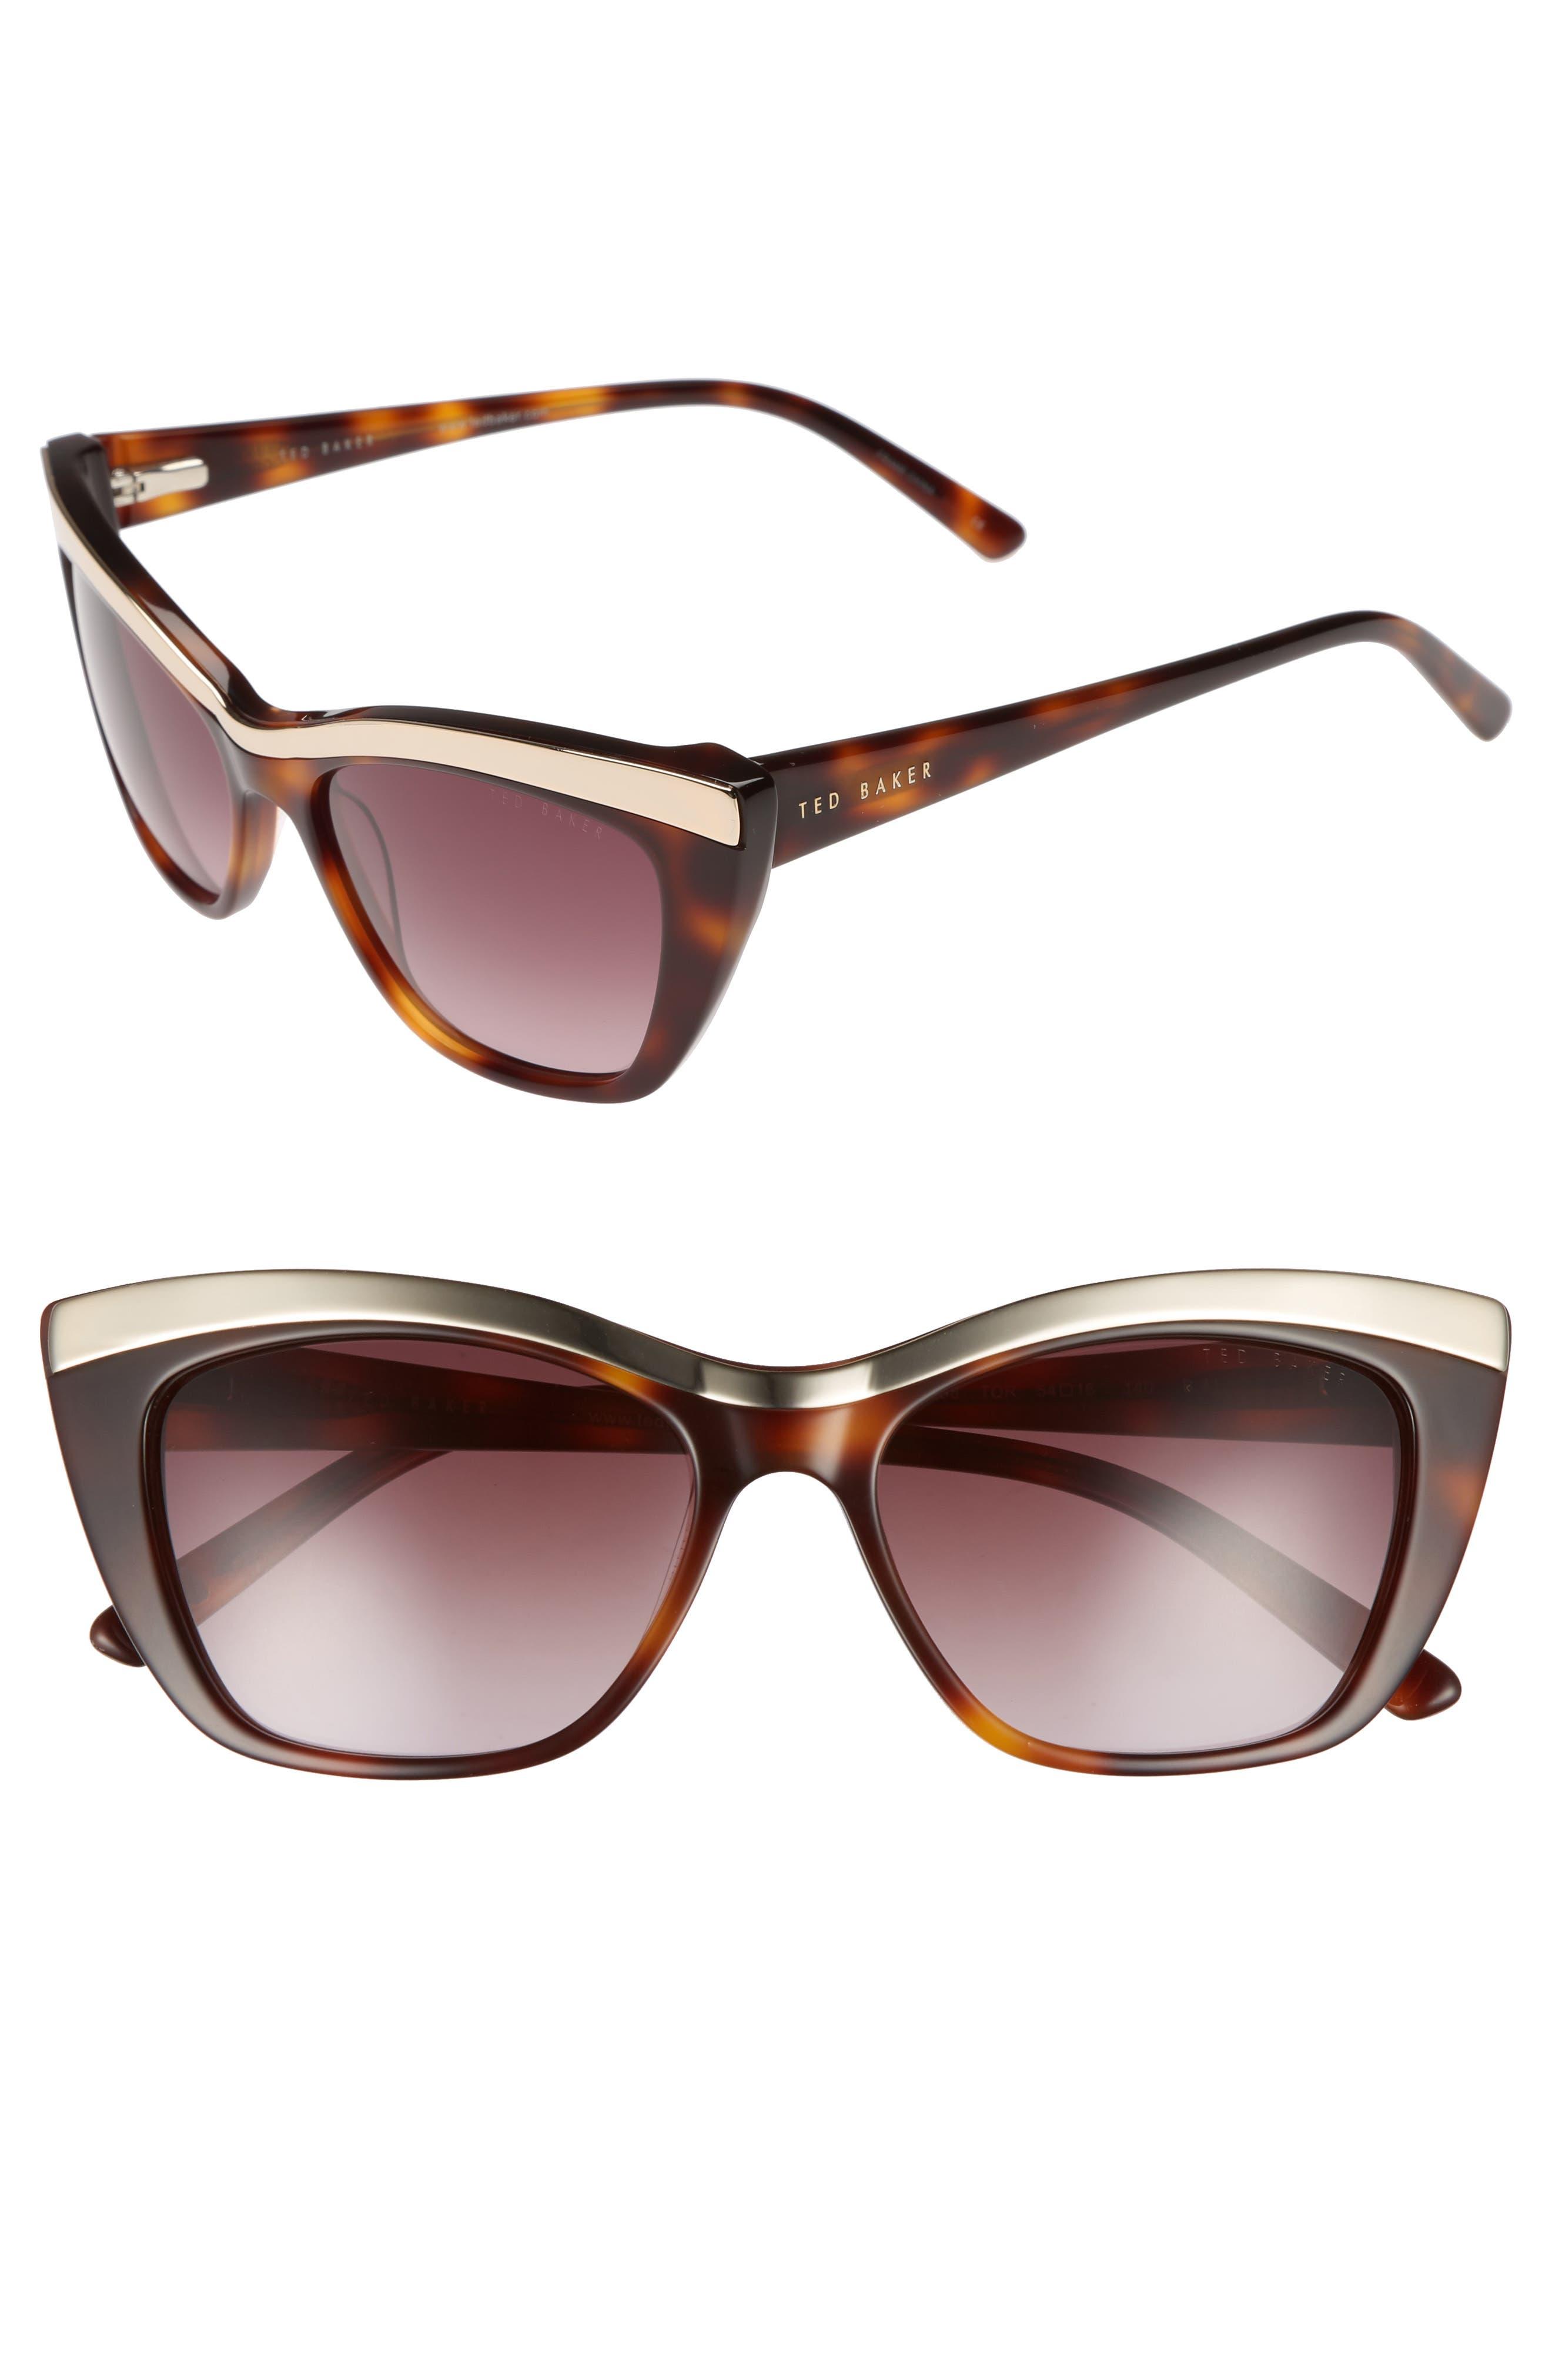 54mm Rectangle Cat Eye Sunglasses,                             Main thumbnail 1, color,                             Tortoise